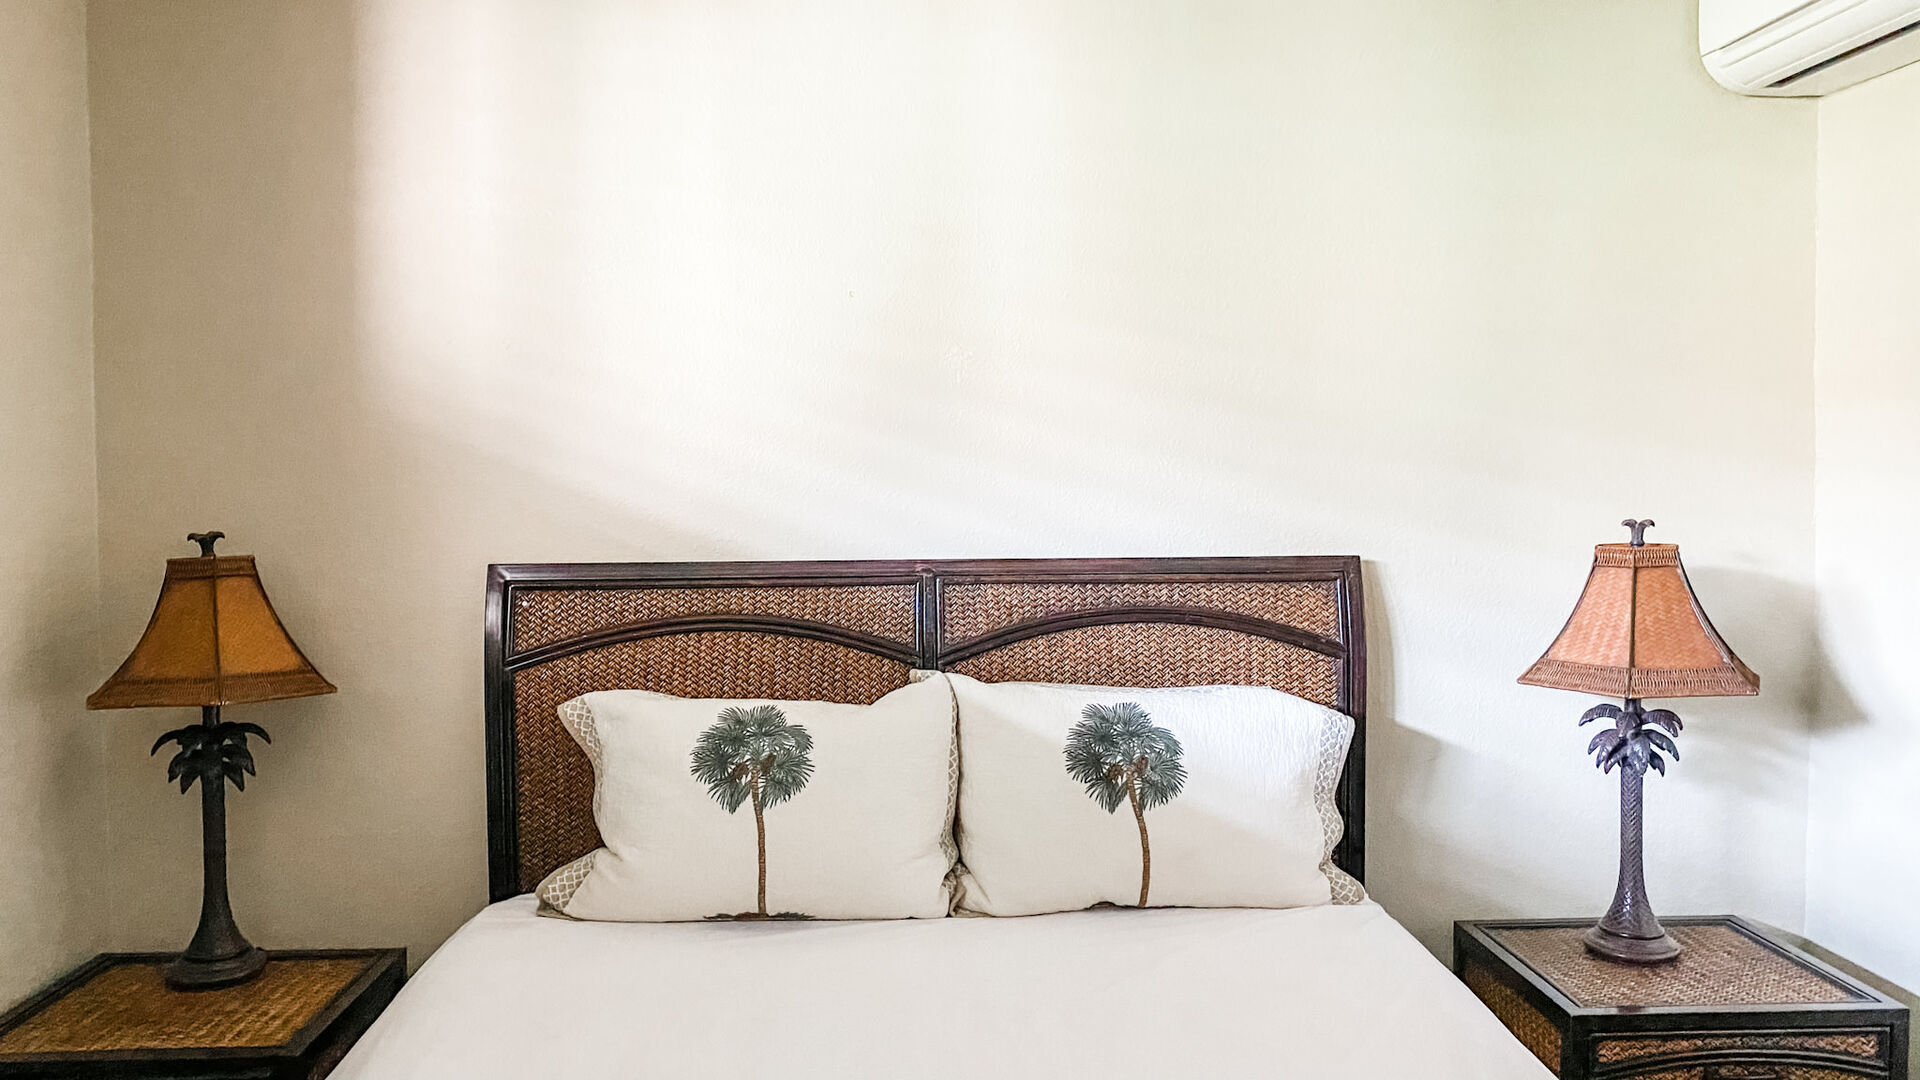 B209 Bedroom